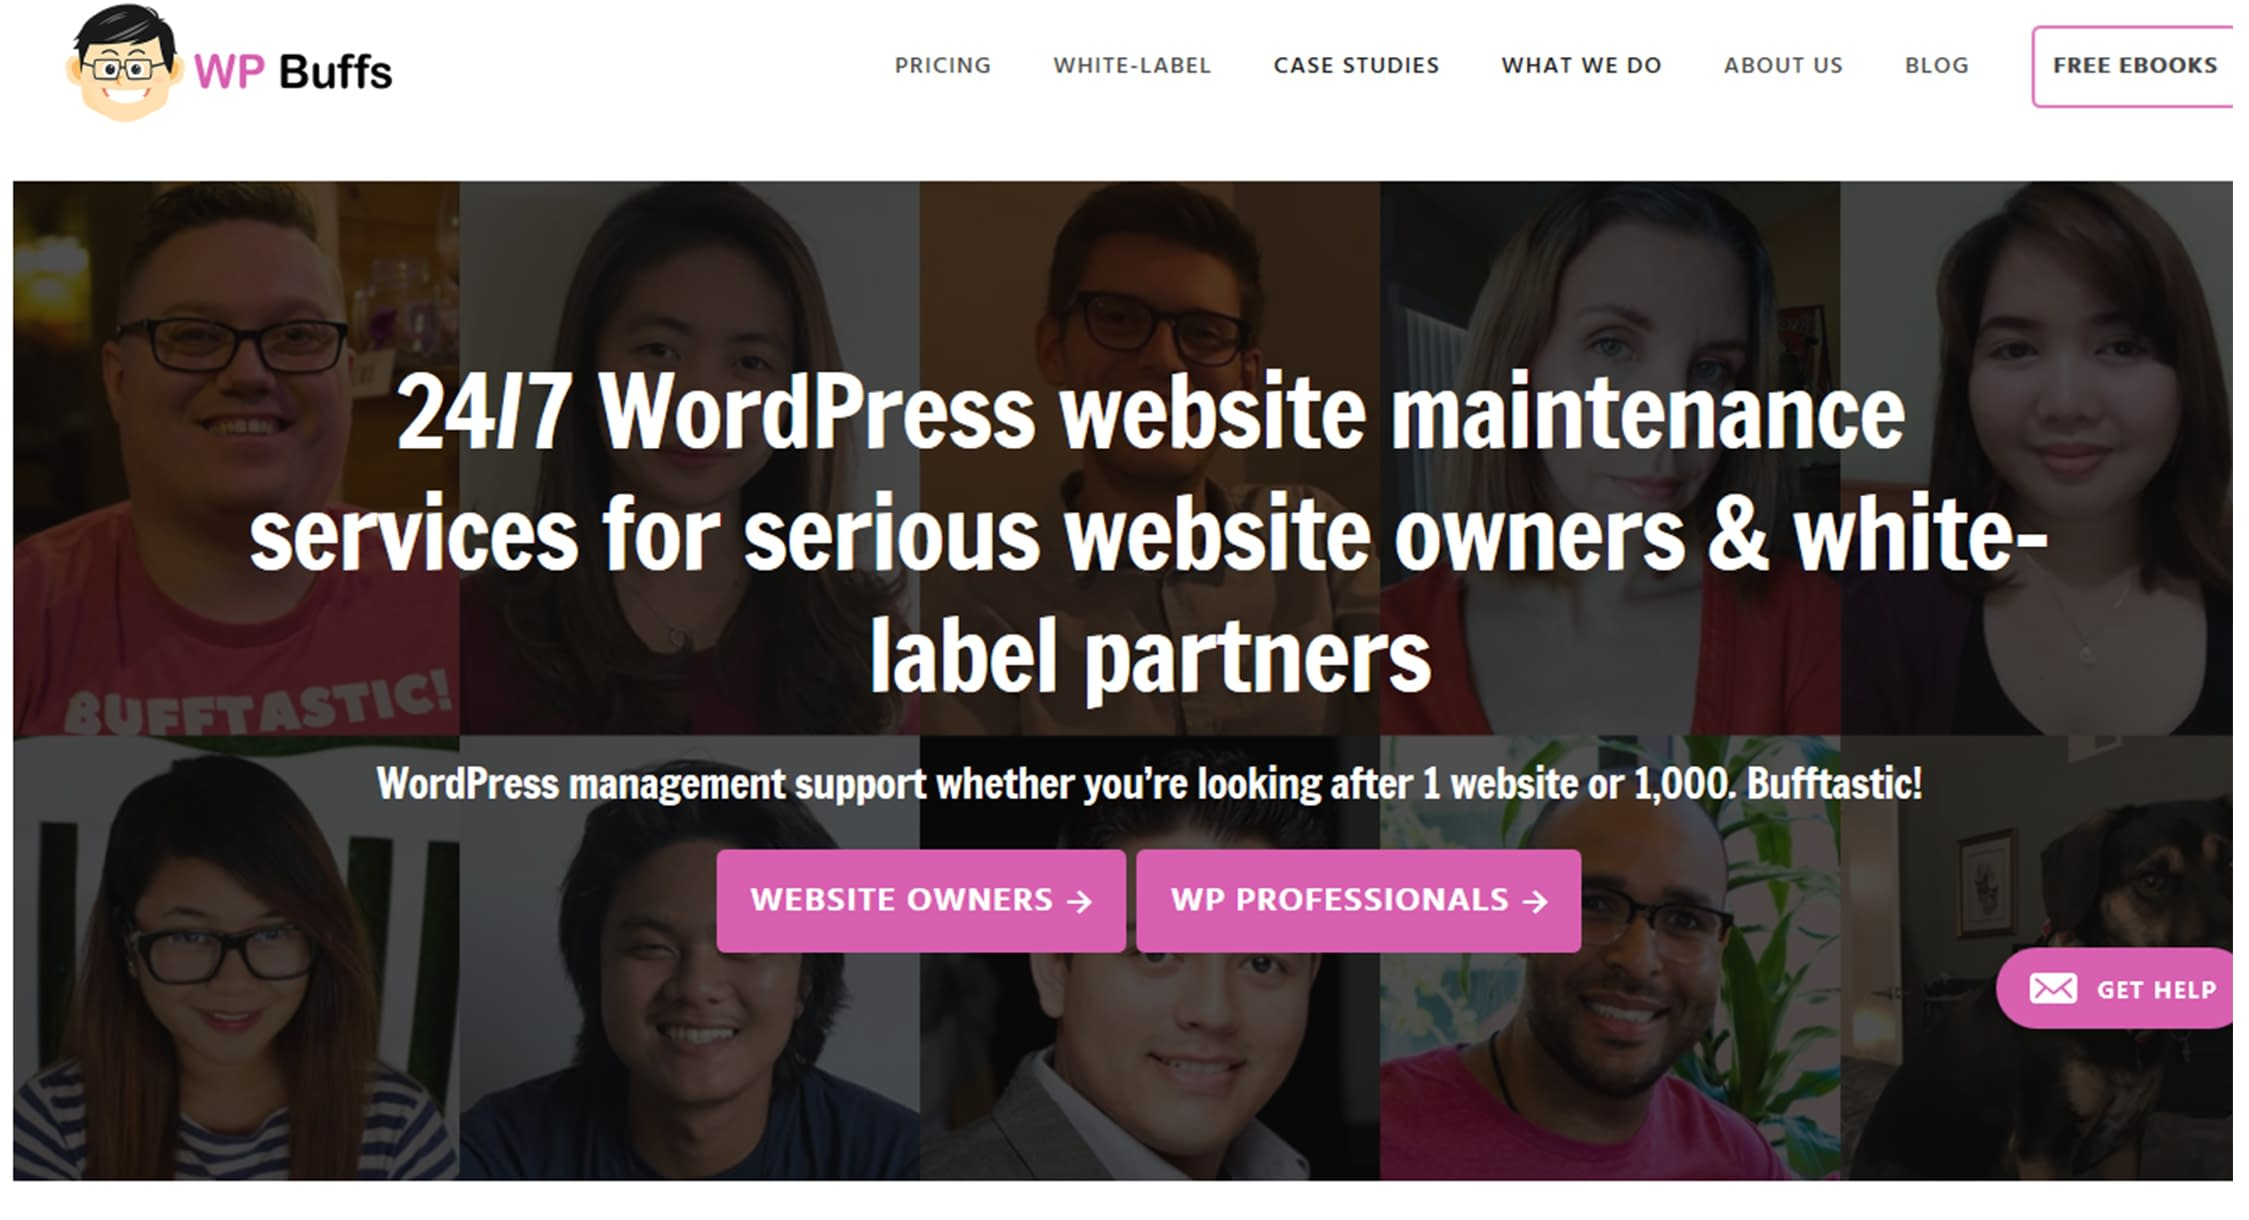 WordPress Deals and Discounts for Halloween 2018 - WPBuff